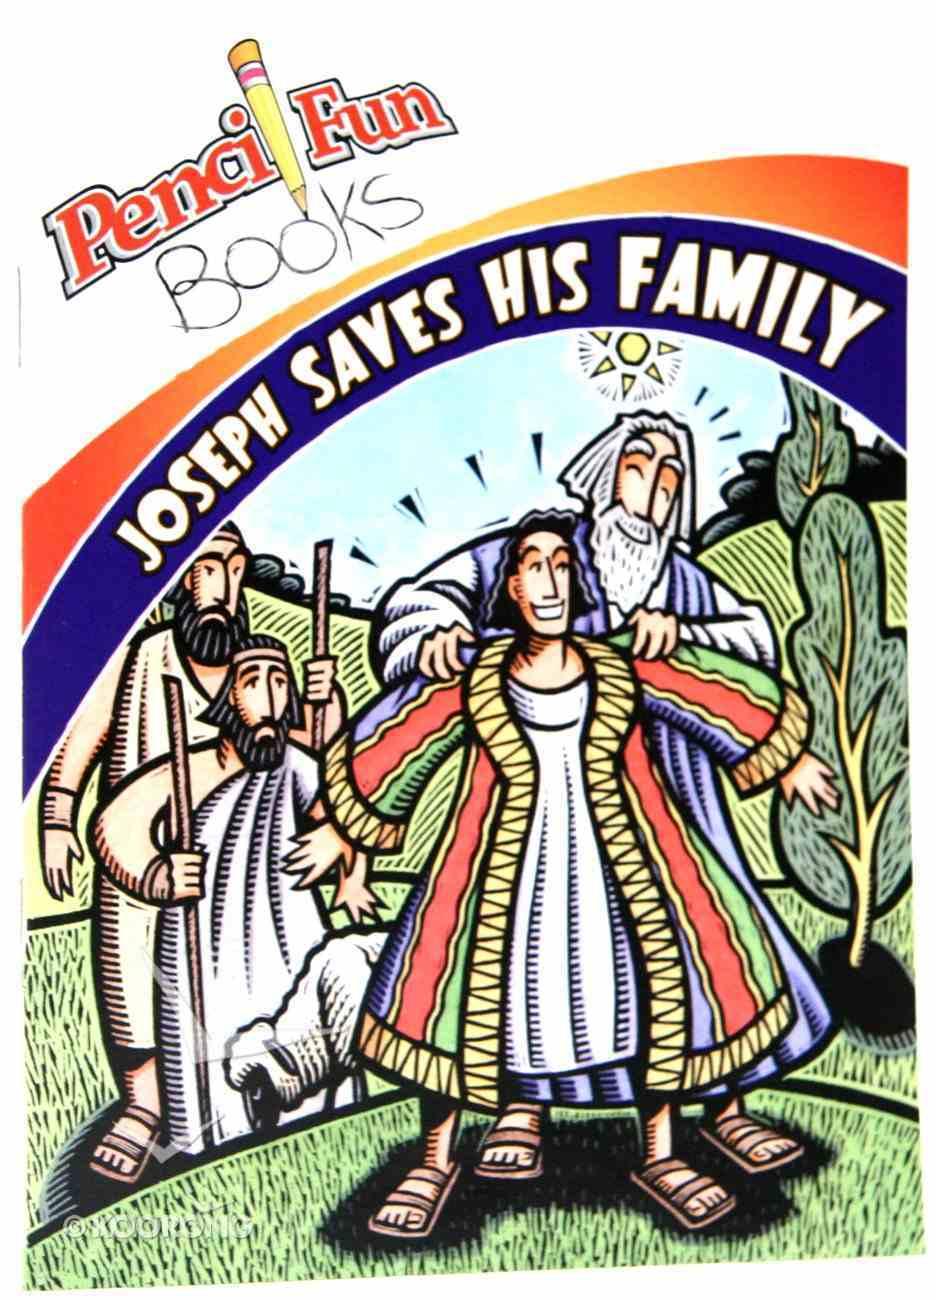 Joseph Saves His Family (Pencil Fun Books Series) Paperback